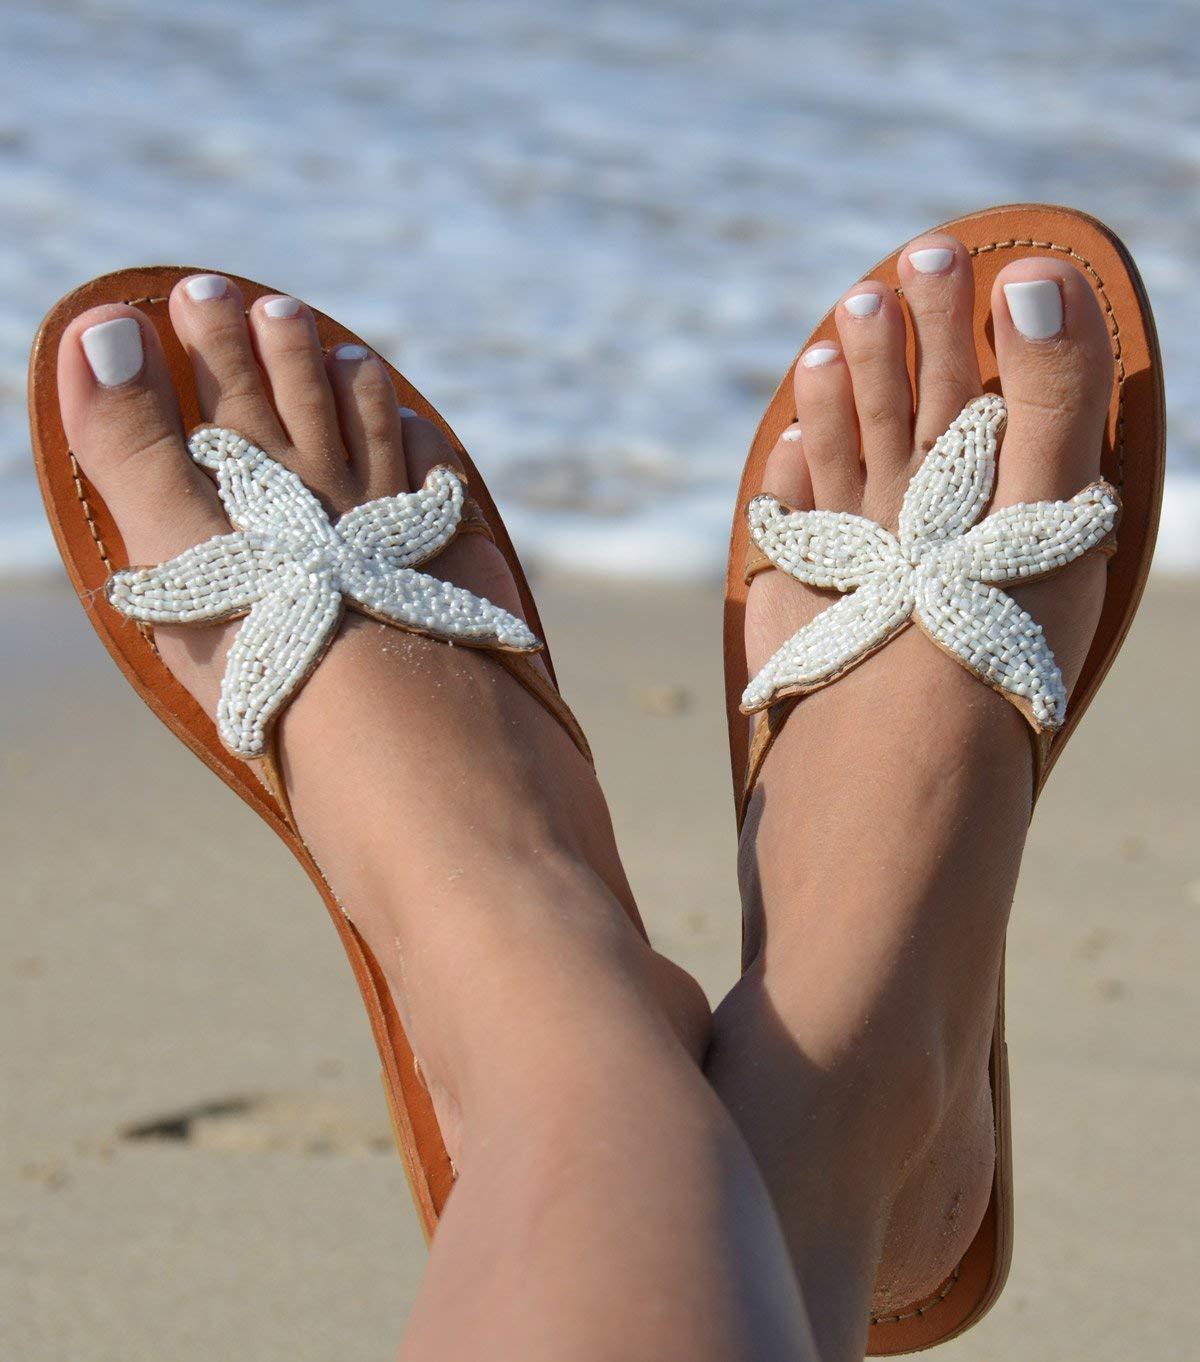 Handmade Creamy White Beaded Starfish Flip-Flop Sandals - DeluxeAdultCostumes.com